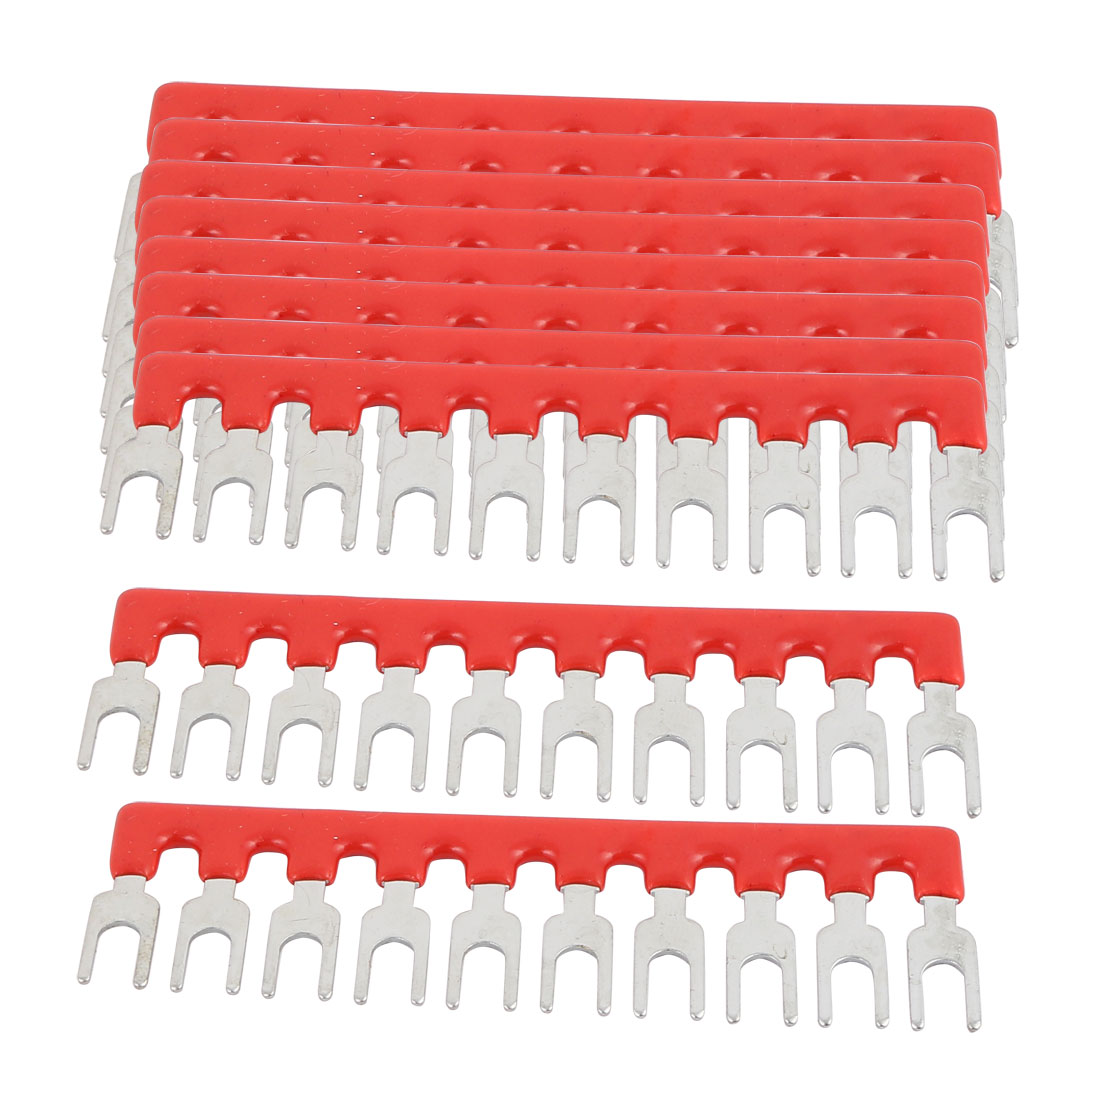 10PCS 600V 15A 5mm Pitch 10P PCB Terminal Block Strip Barrier Red Silver Tone